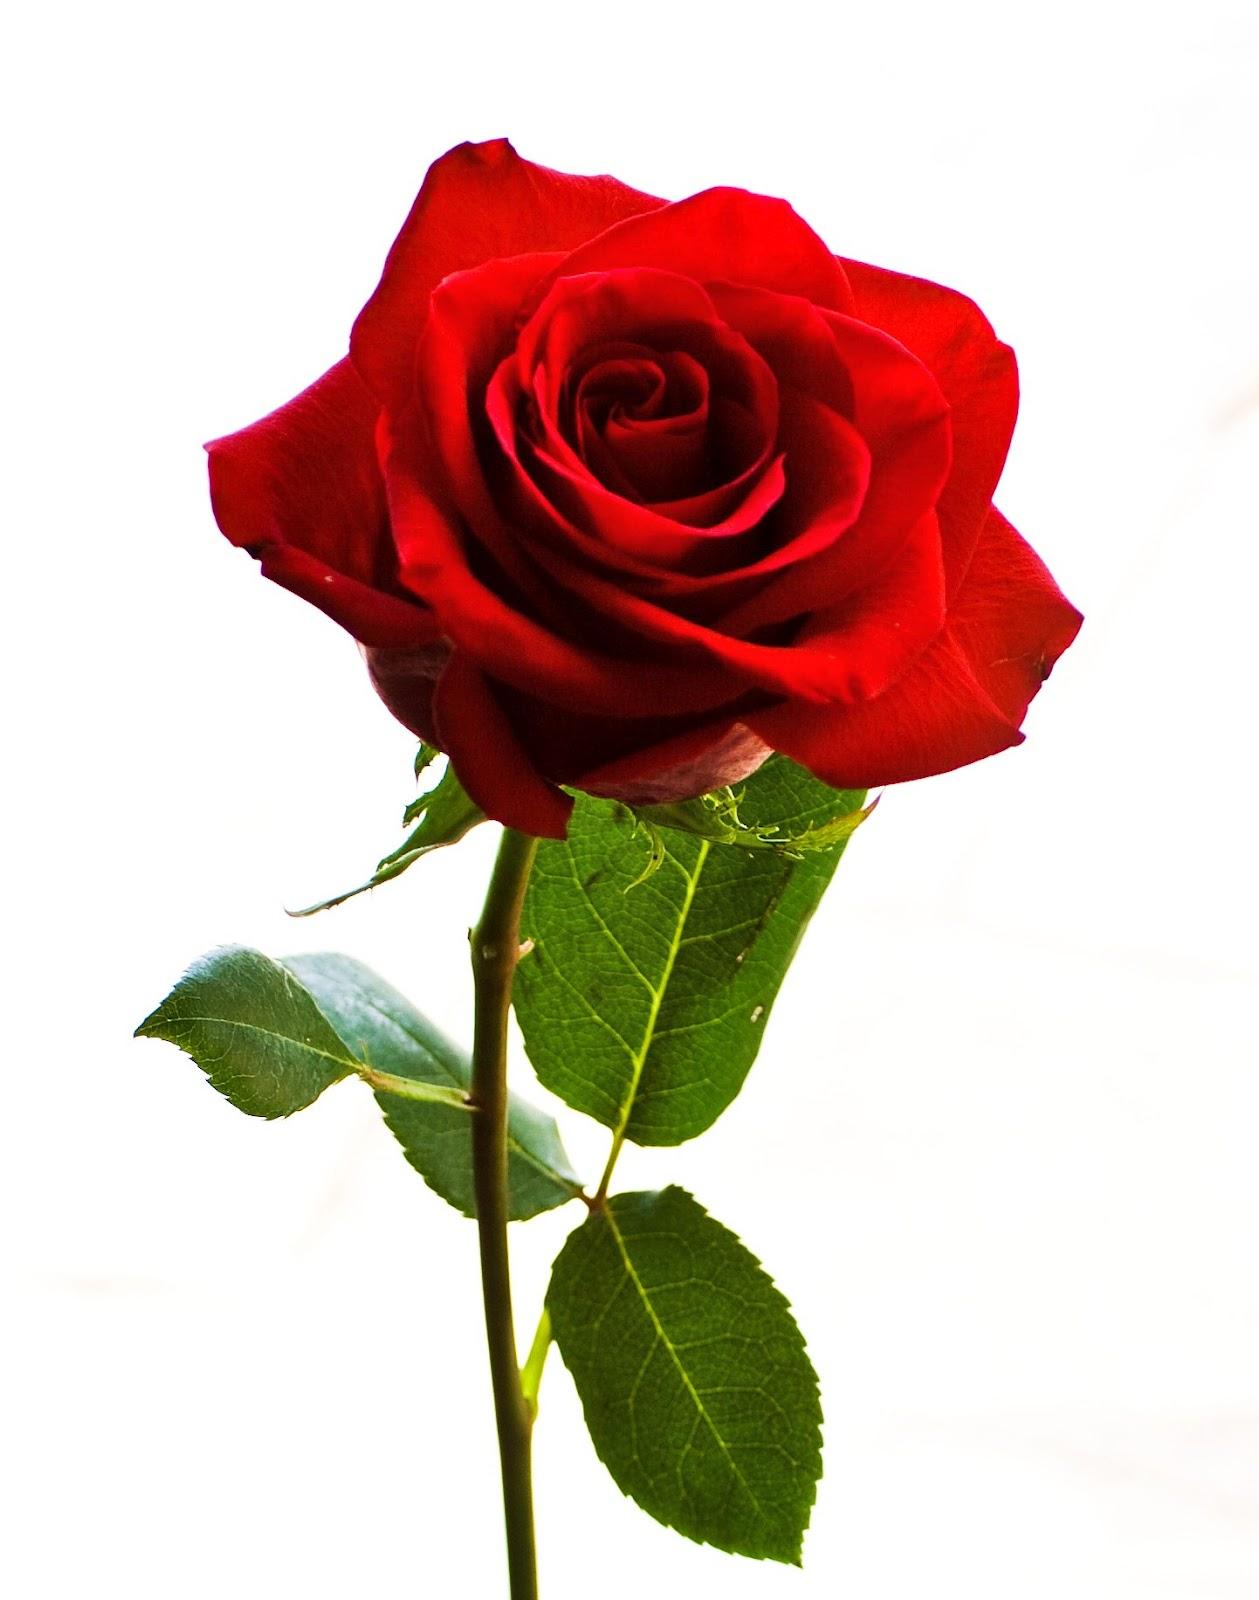 kisah bunga mawar di hati kita